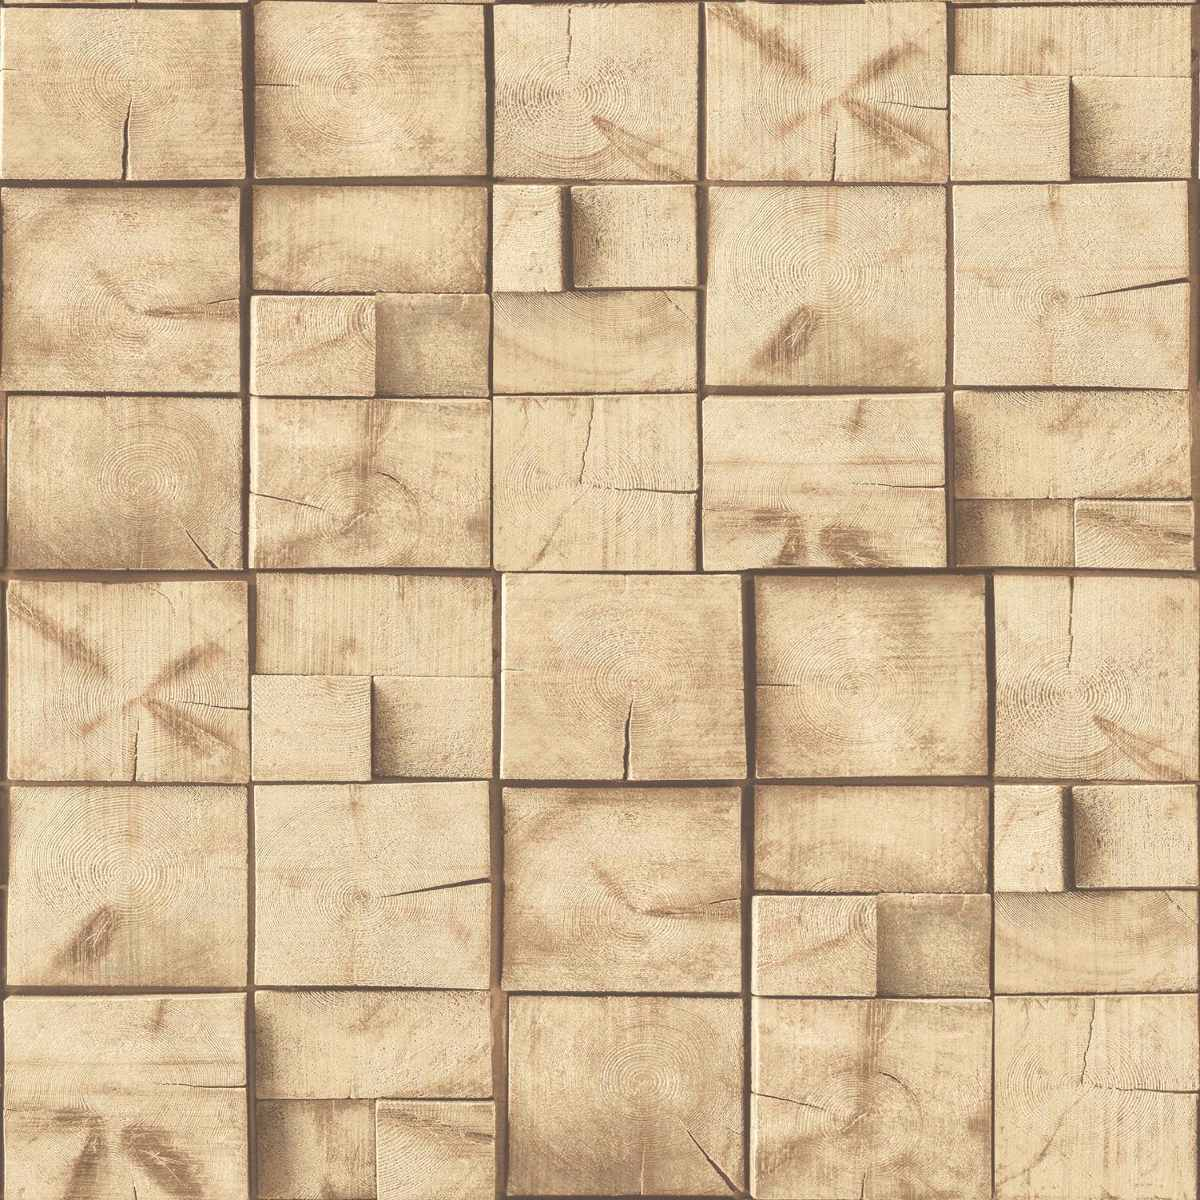 Papel de parede madeira replik vin lico texturizado - Papel adhesivo para paredes ...